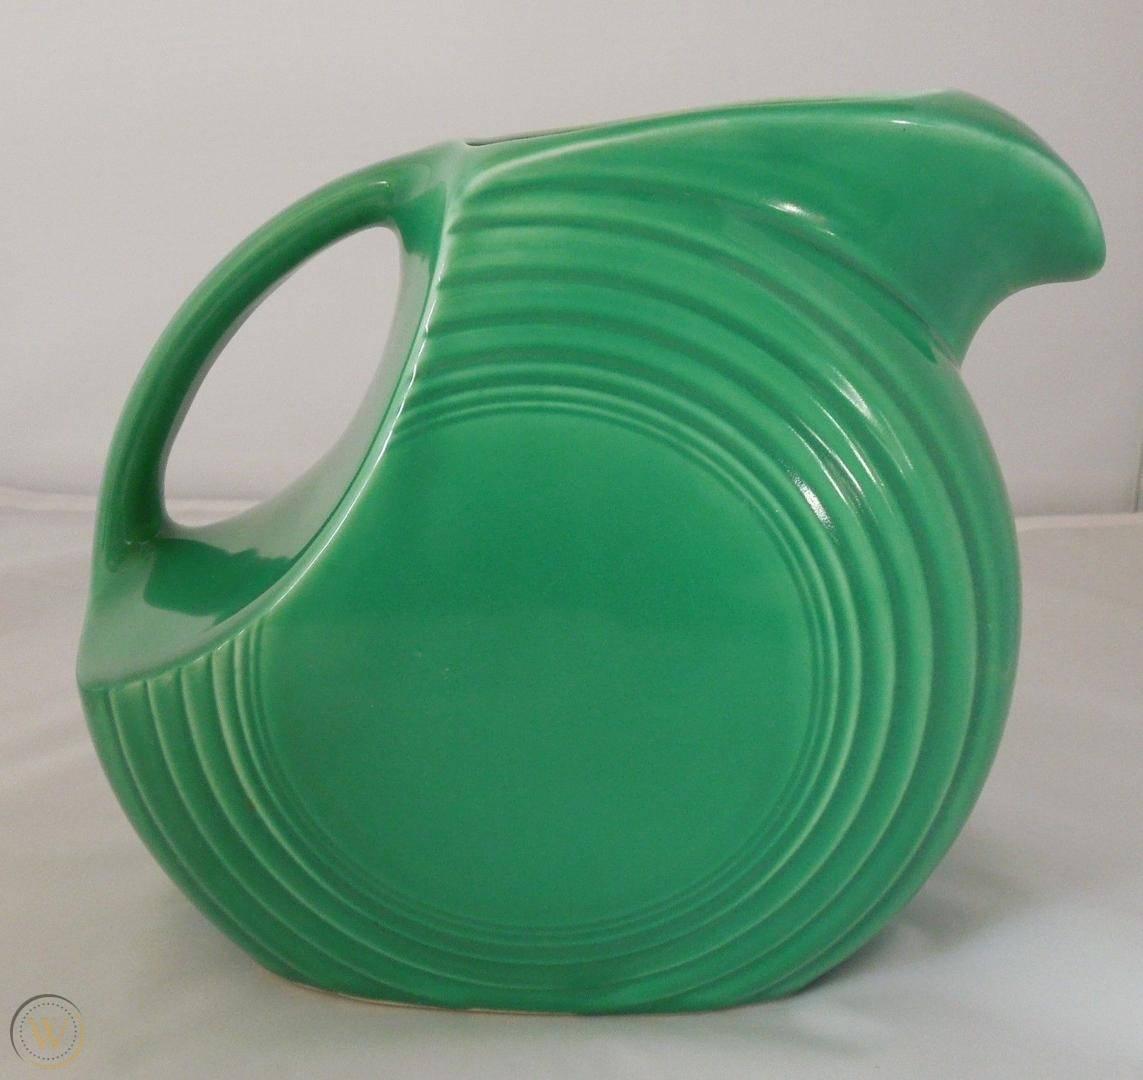 Fiesta vintage medium green disc 1 9017756d85aa288ce607f2d8b20ccbe1 2